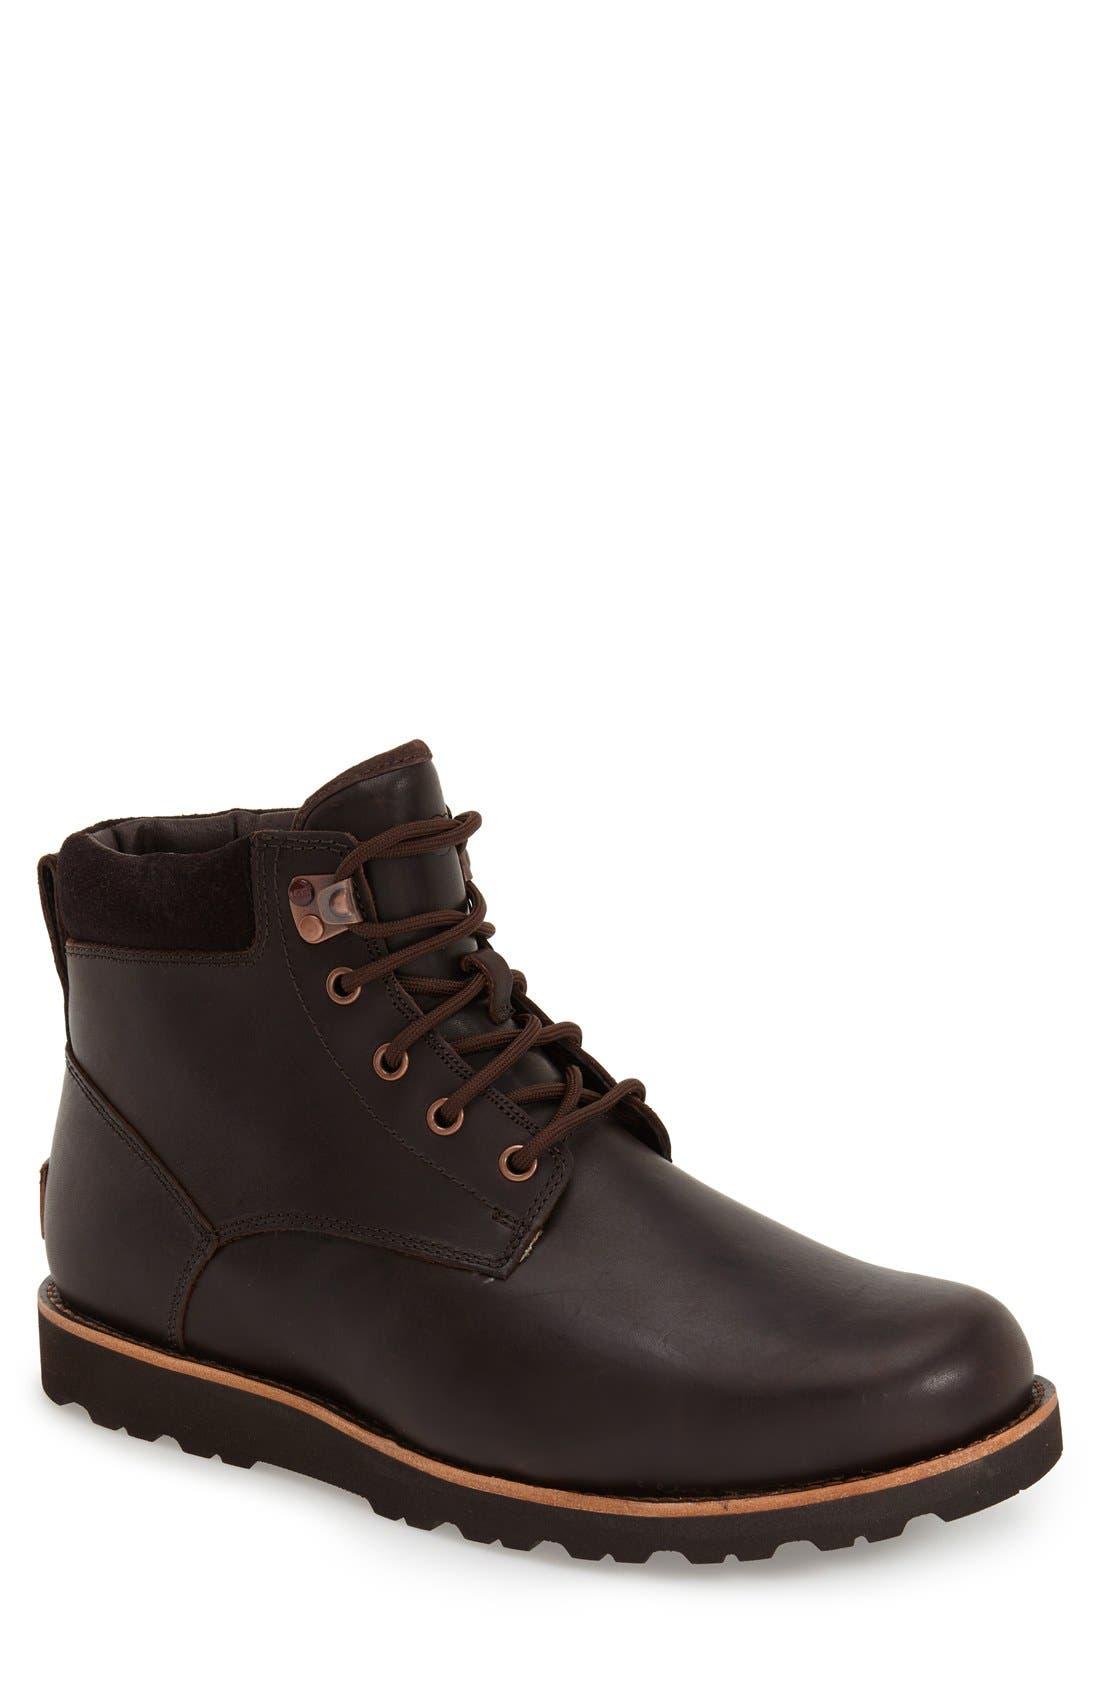 Main Image - UGG®Seton Waterproof Chukka Boot (Men)